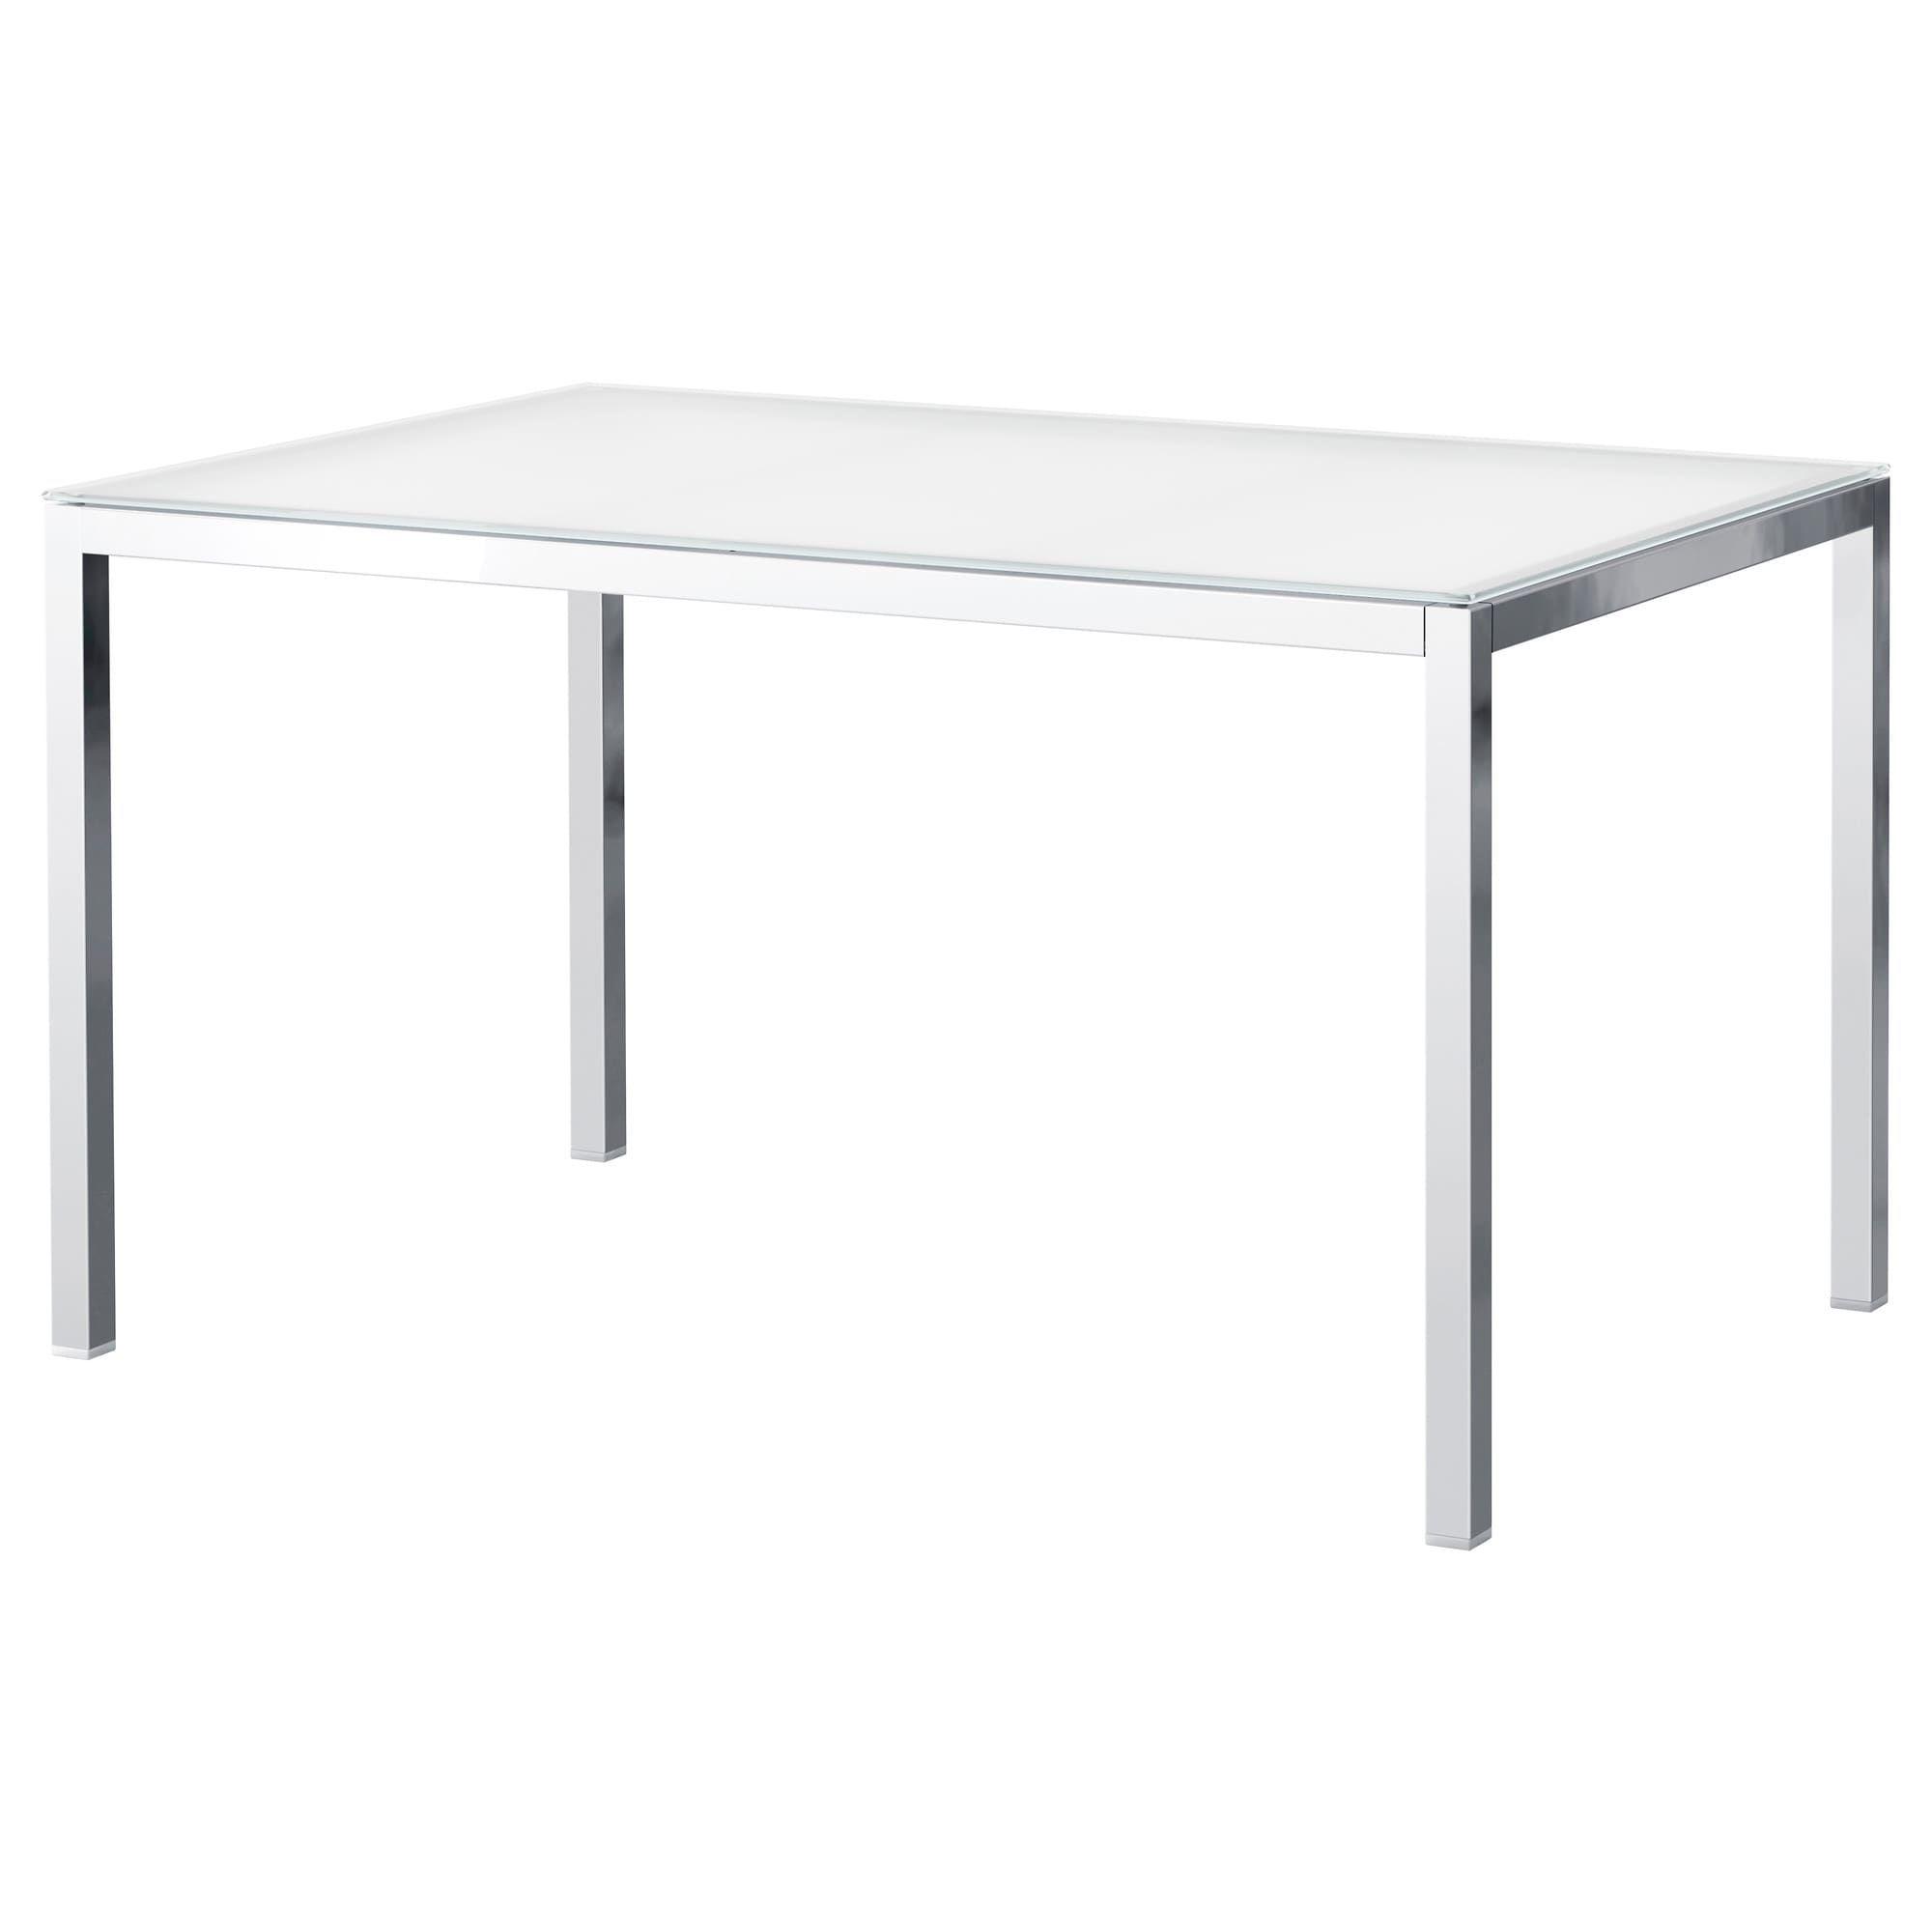 Us Furniture And Home Furnishings Ikea Dining Table Ikea